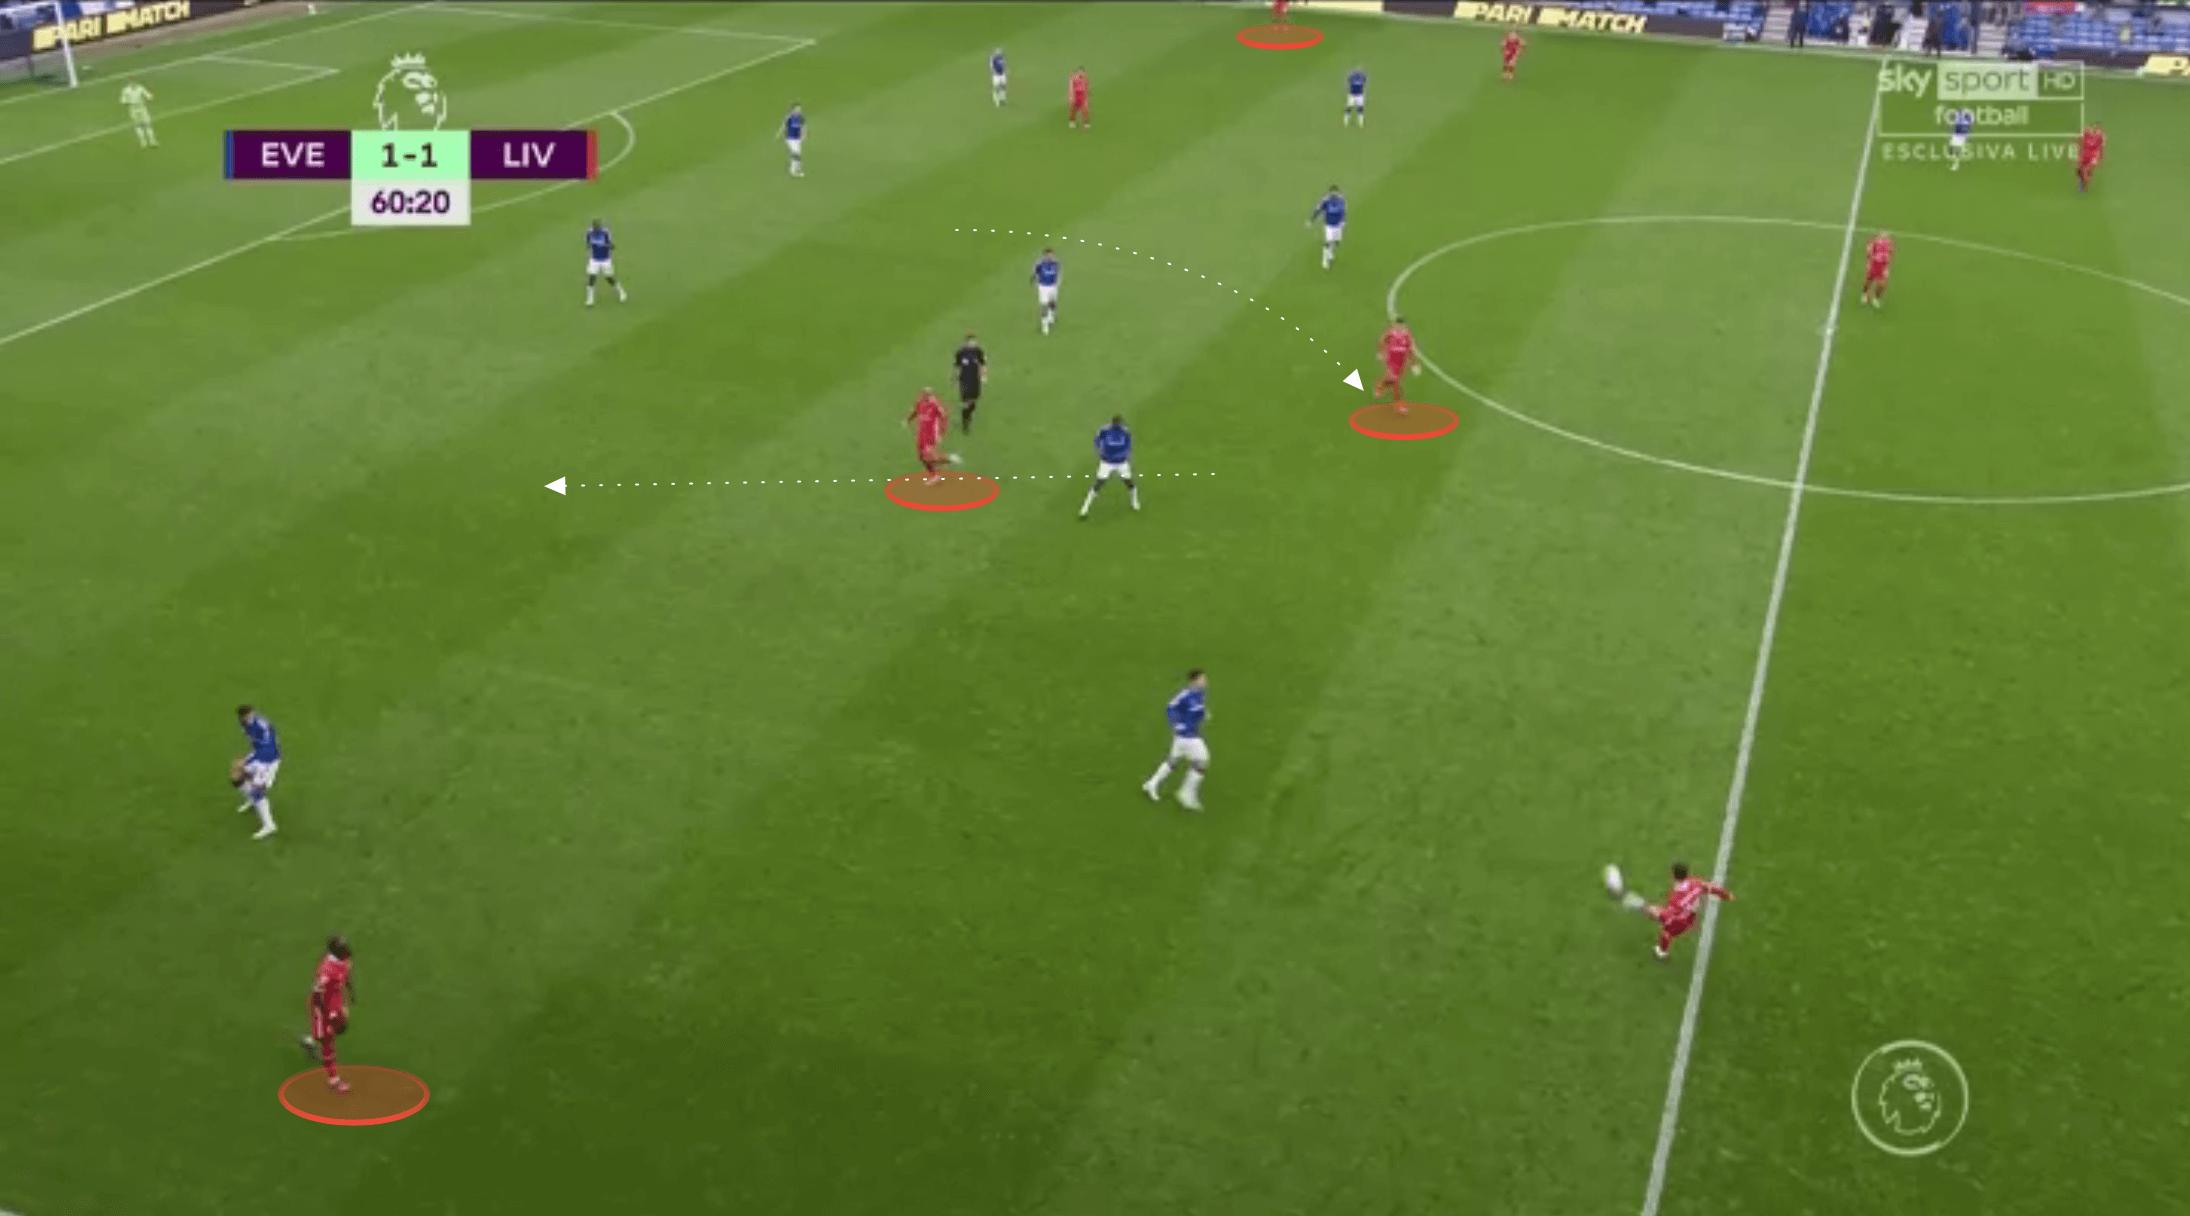 Premier League 2020/21: Liverpool vs Sheffield United - tactical preview tactics